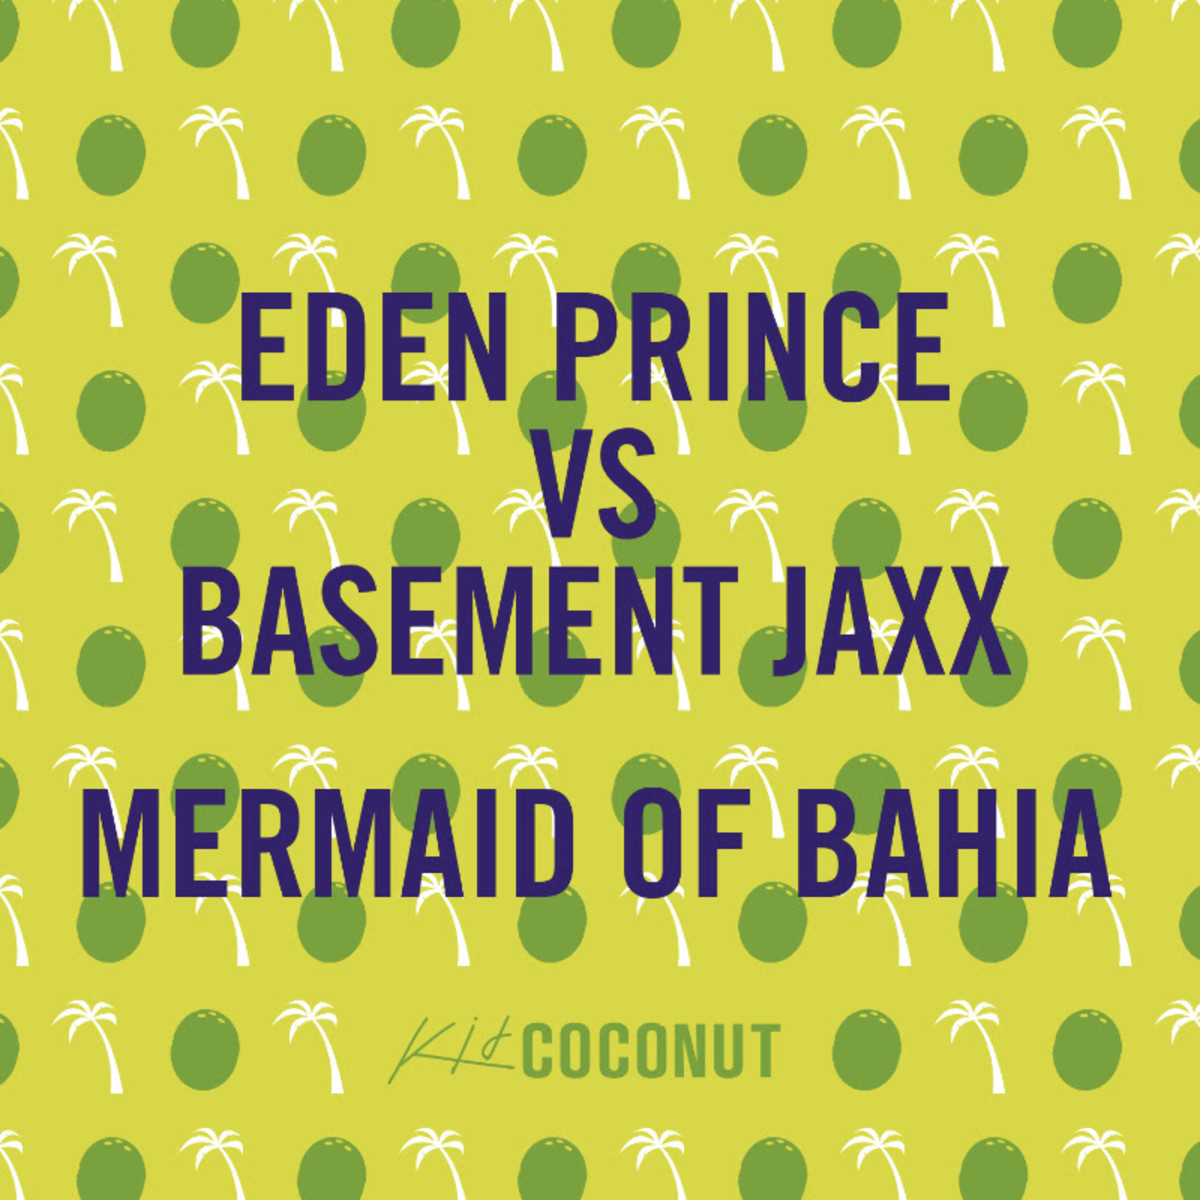 mermaid of bahia eden prince basement jaxx